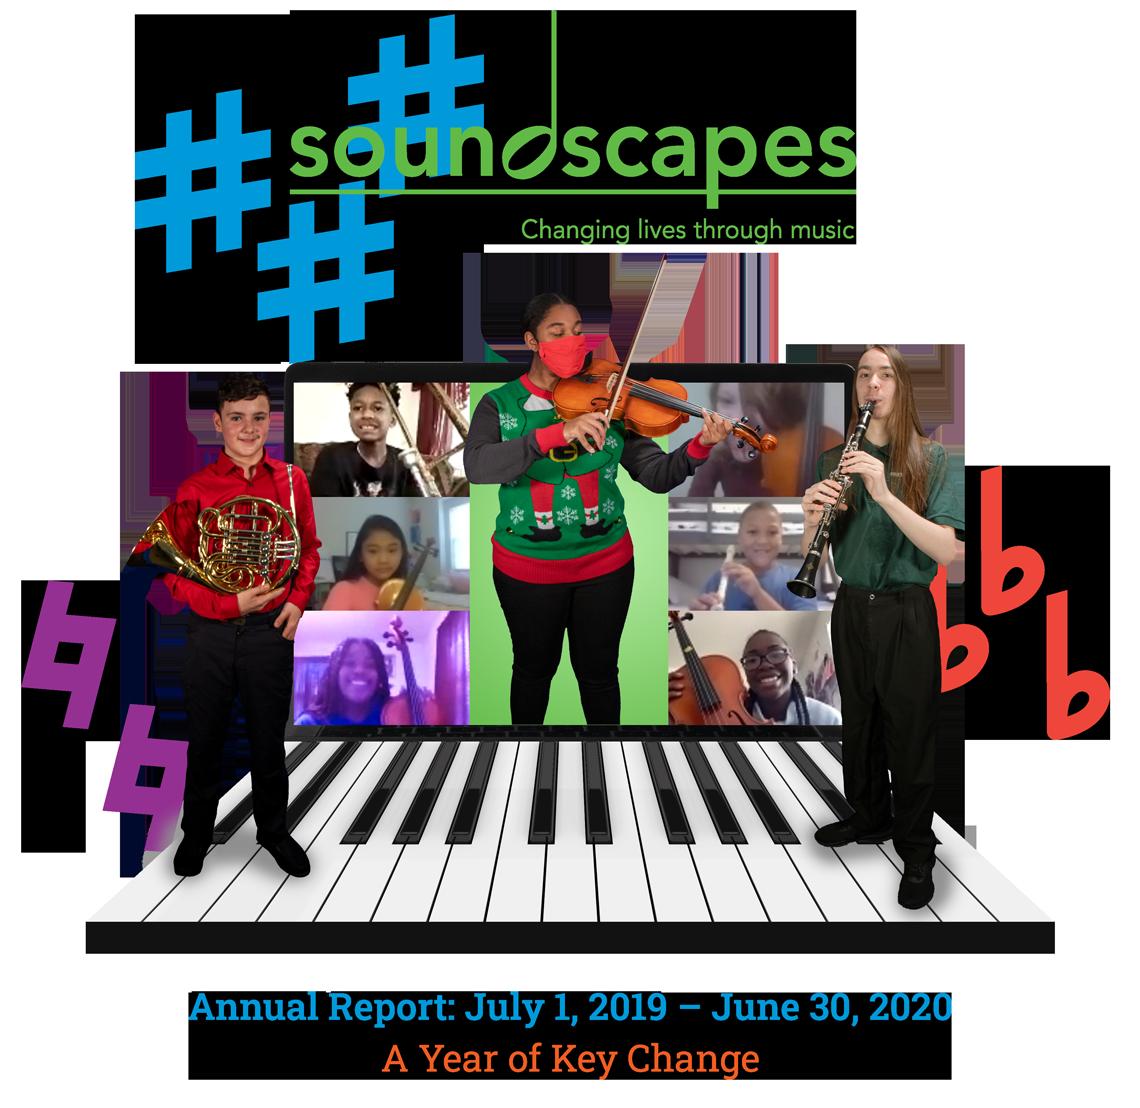 Soundscapes Annual Report 2019